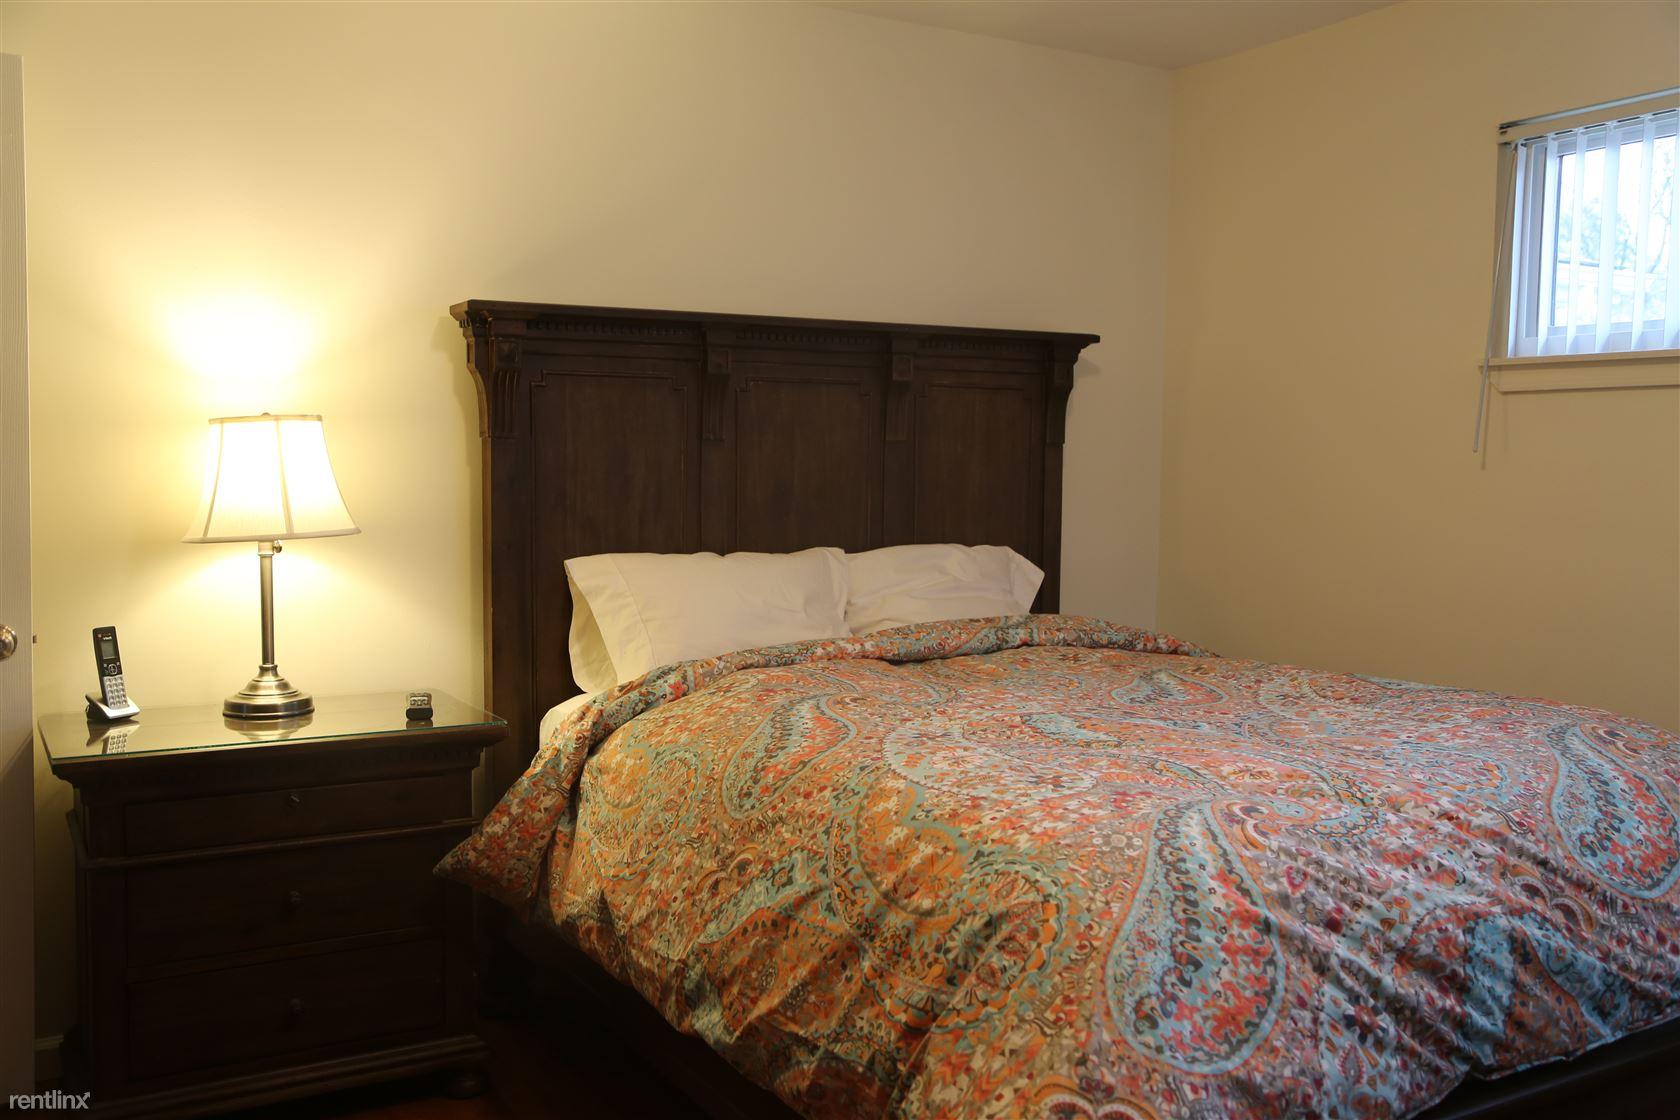 21930 Whitmore St Rm 1, Oak Park, MI - $600